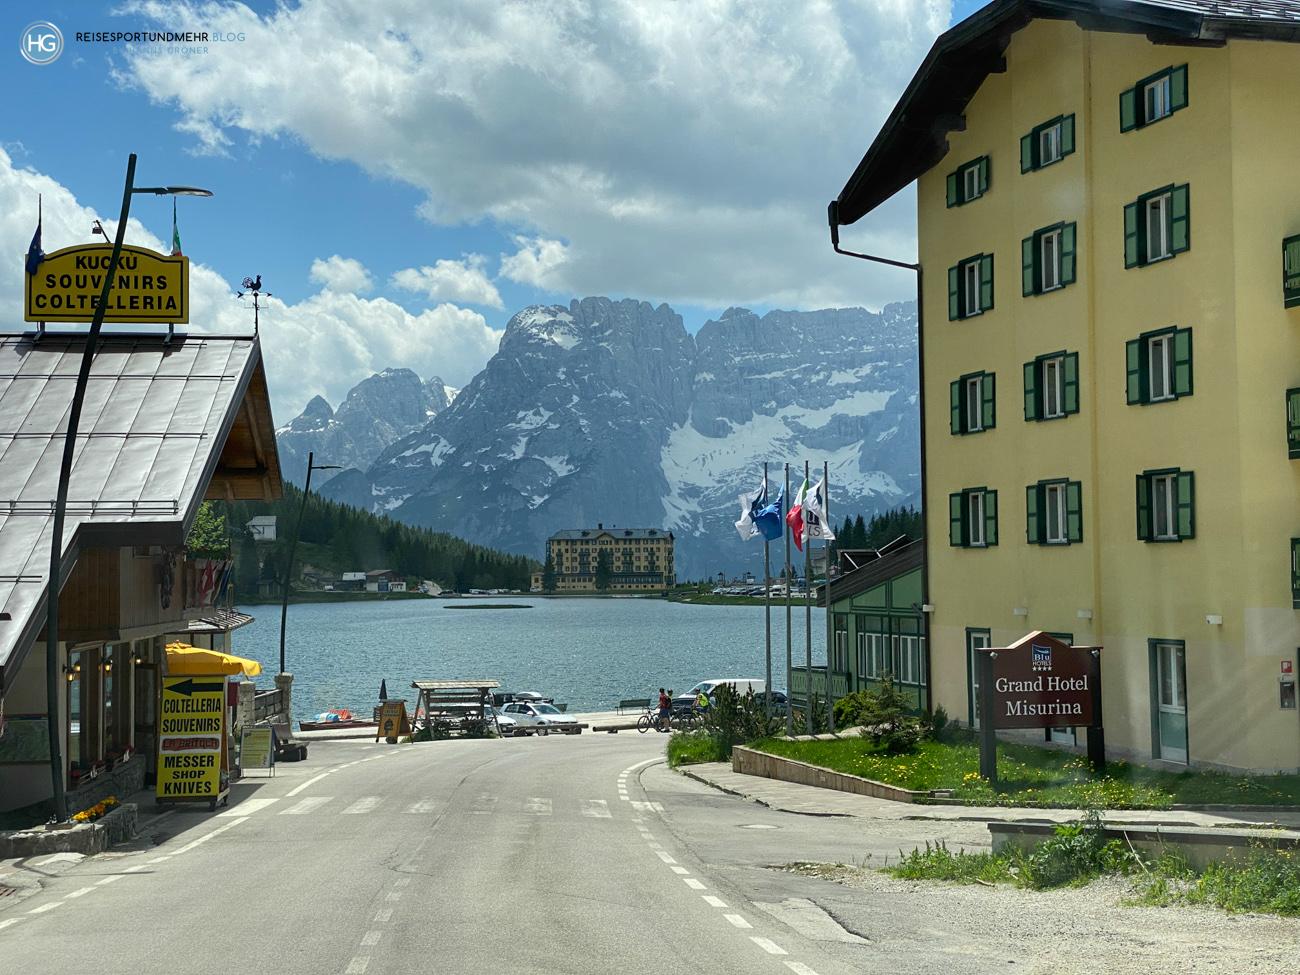 Südtirol 2021 - Misurina (Foto: Hann Gröner)